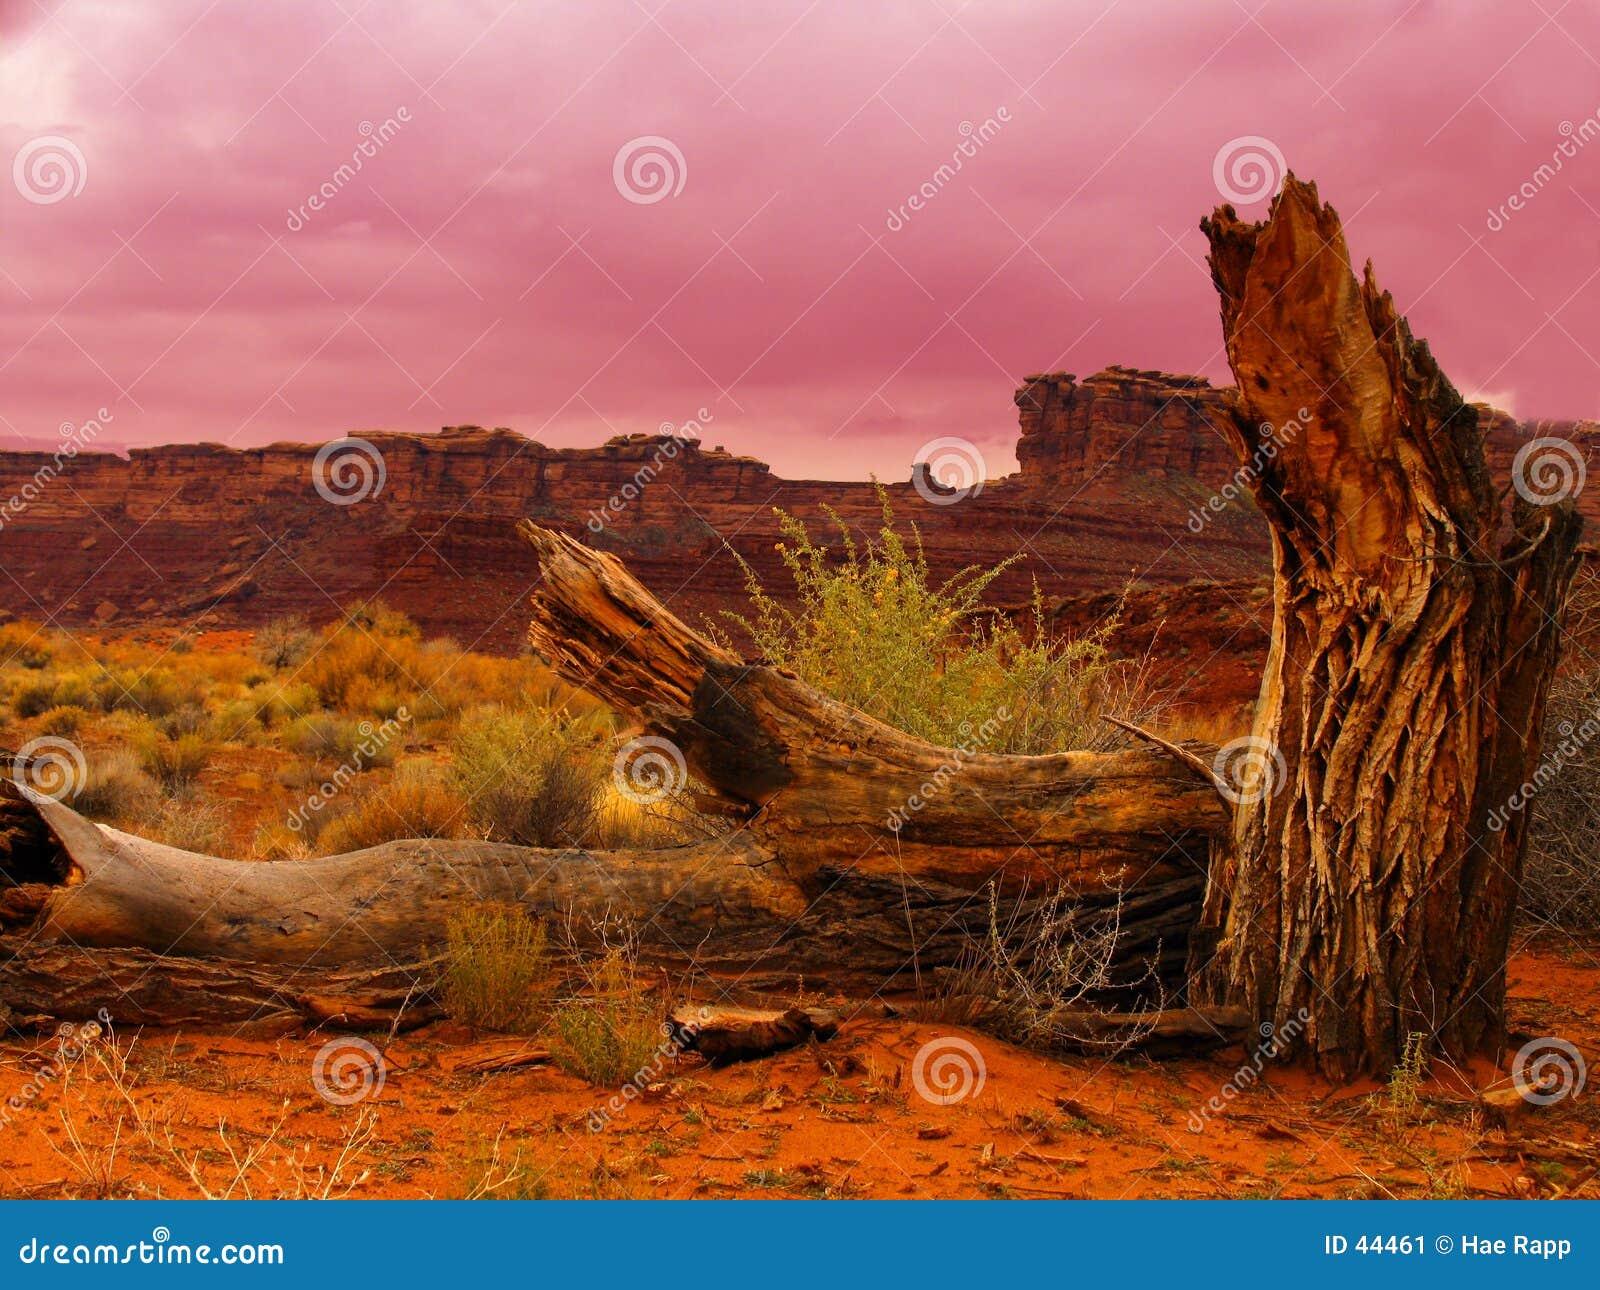 Download Toter Baum stockbild. Bild von nave, holz, bäume, landschaft - 44461